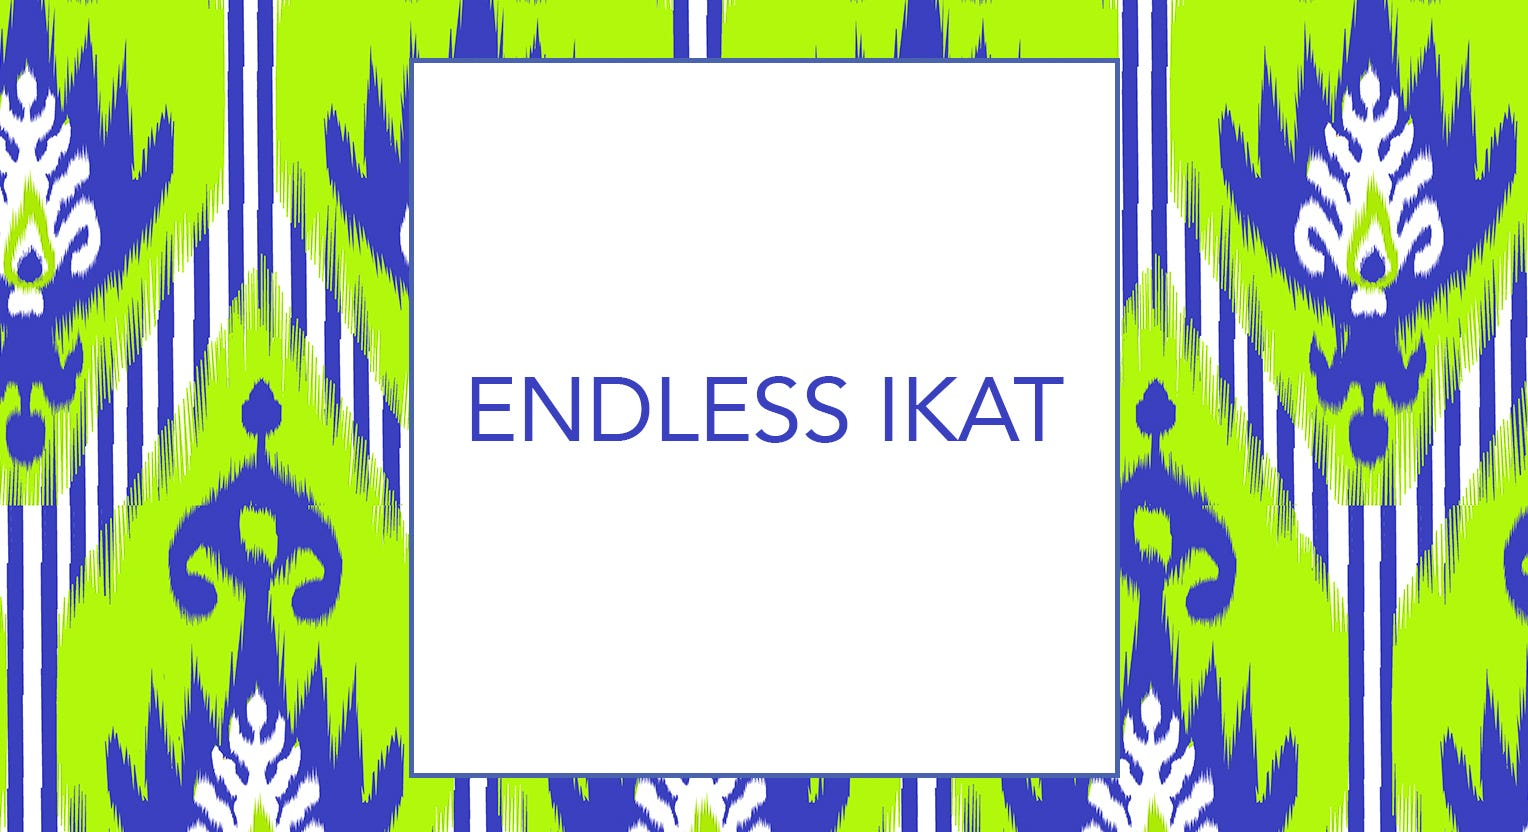 Endless Ikat